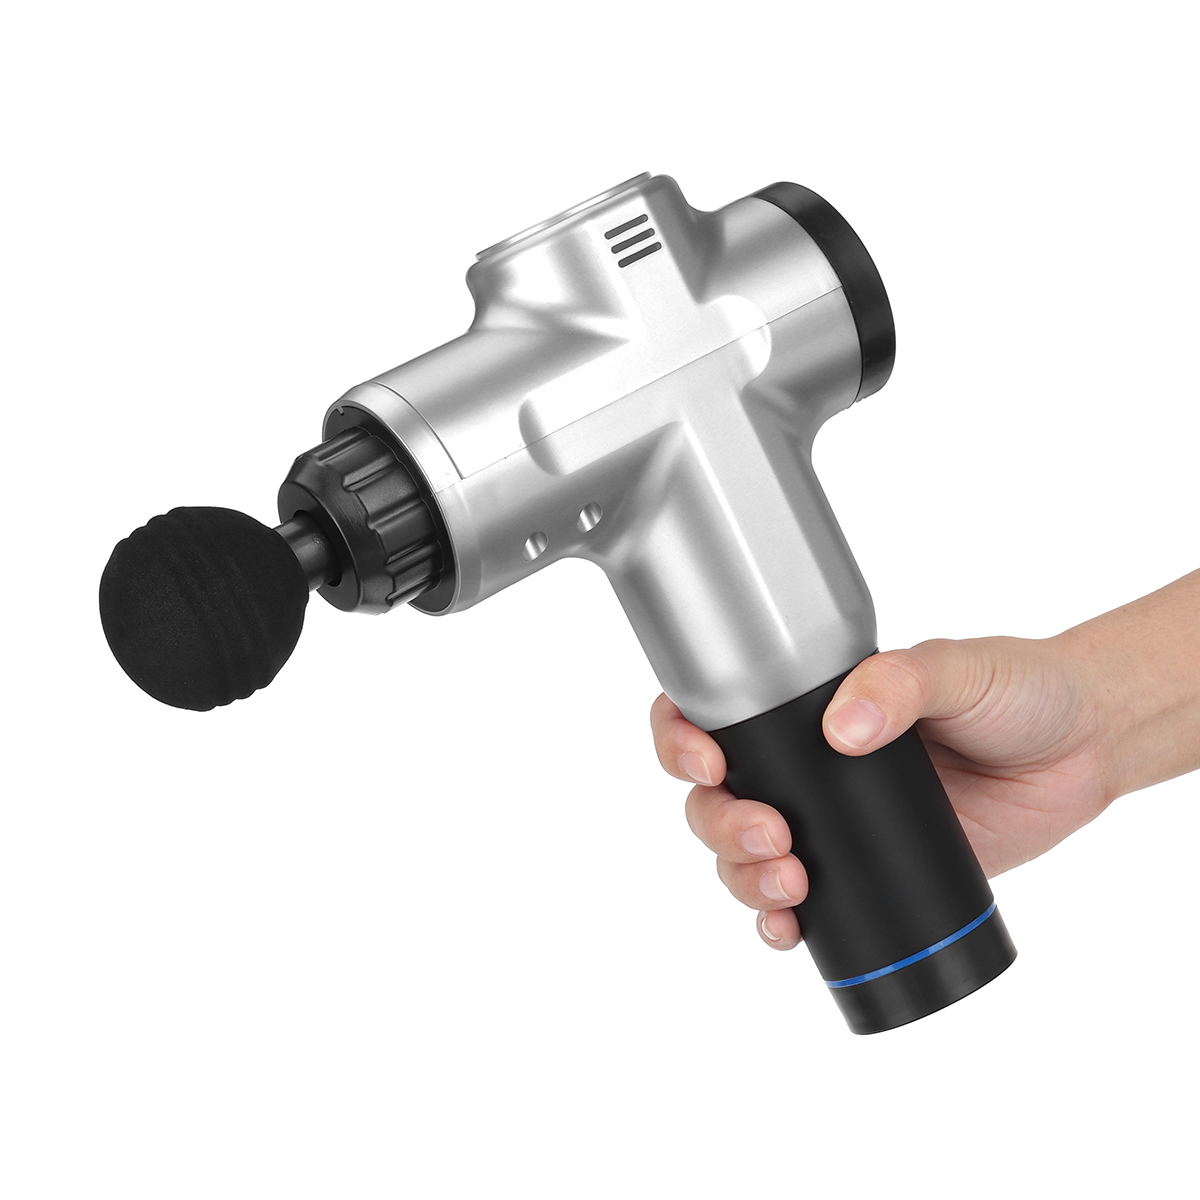 6 Gears Deep muscle massager LCD Display Massage gun Muscle Relaxation gun 4 head 2000 rpm to 4300 rpm Pain Relif Body Relax